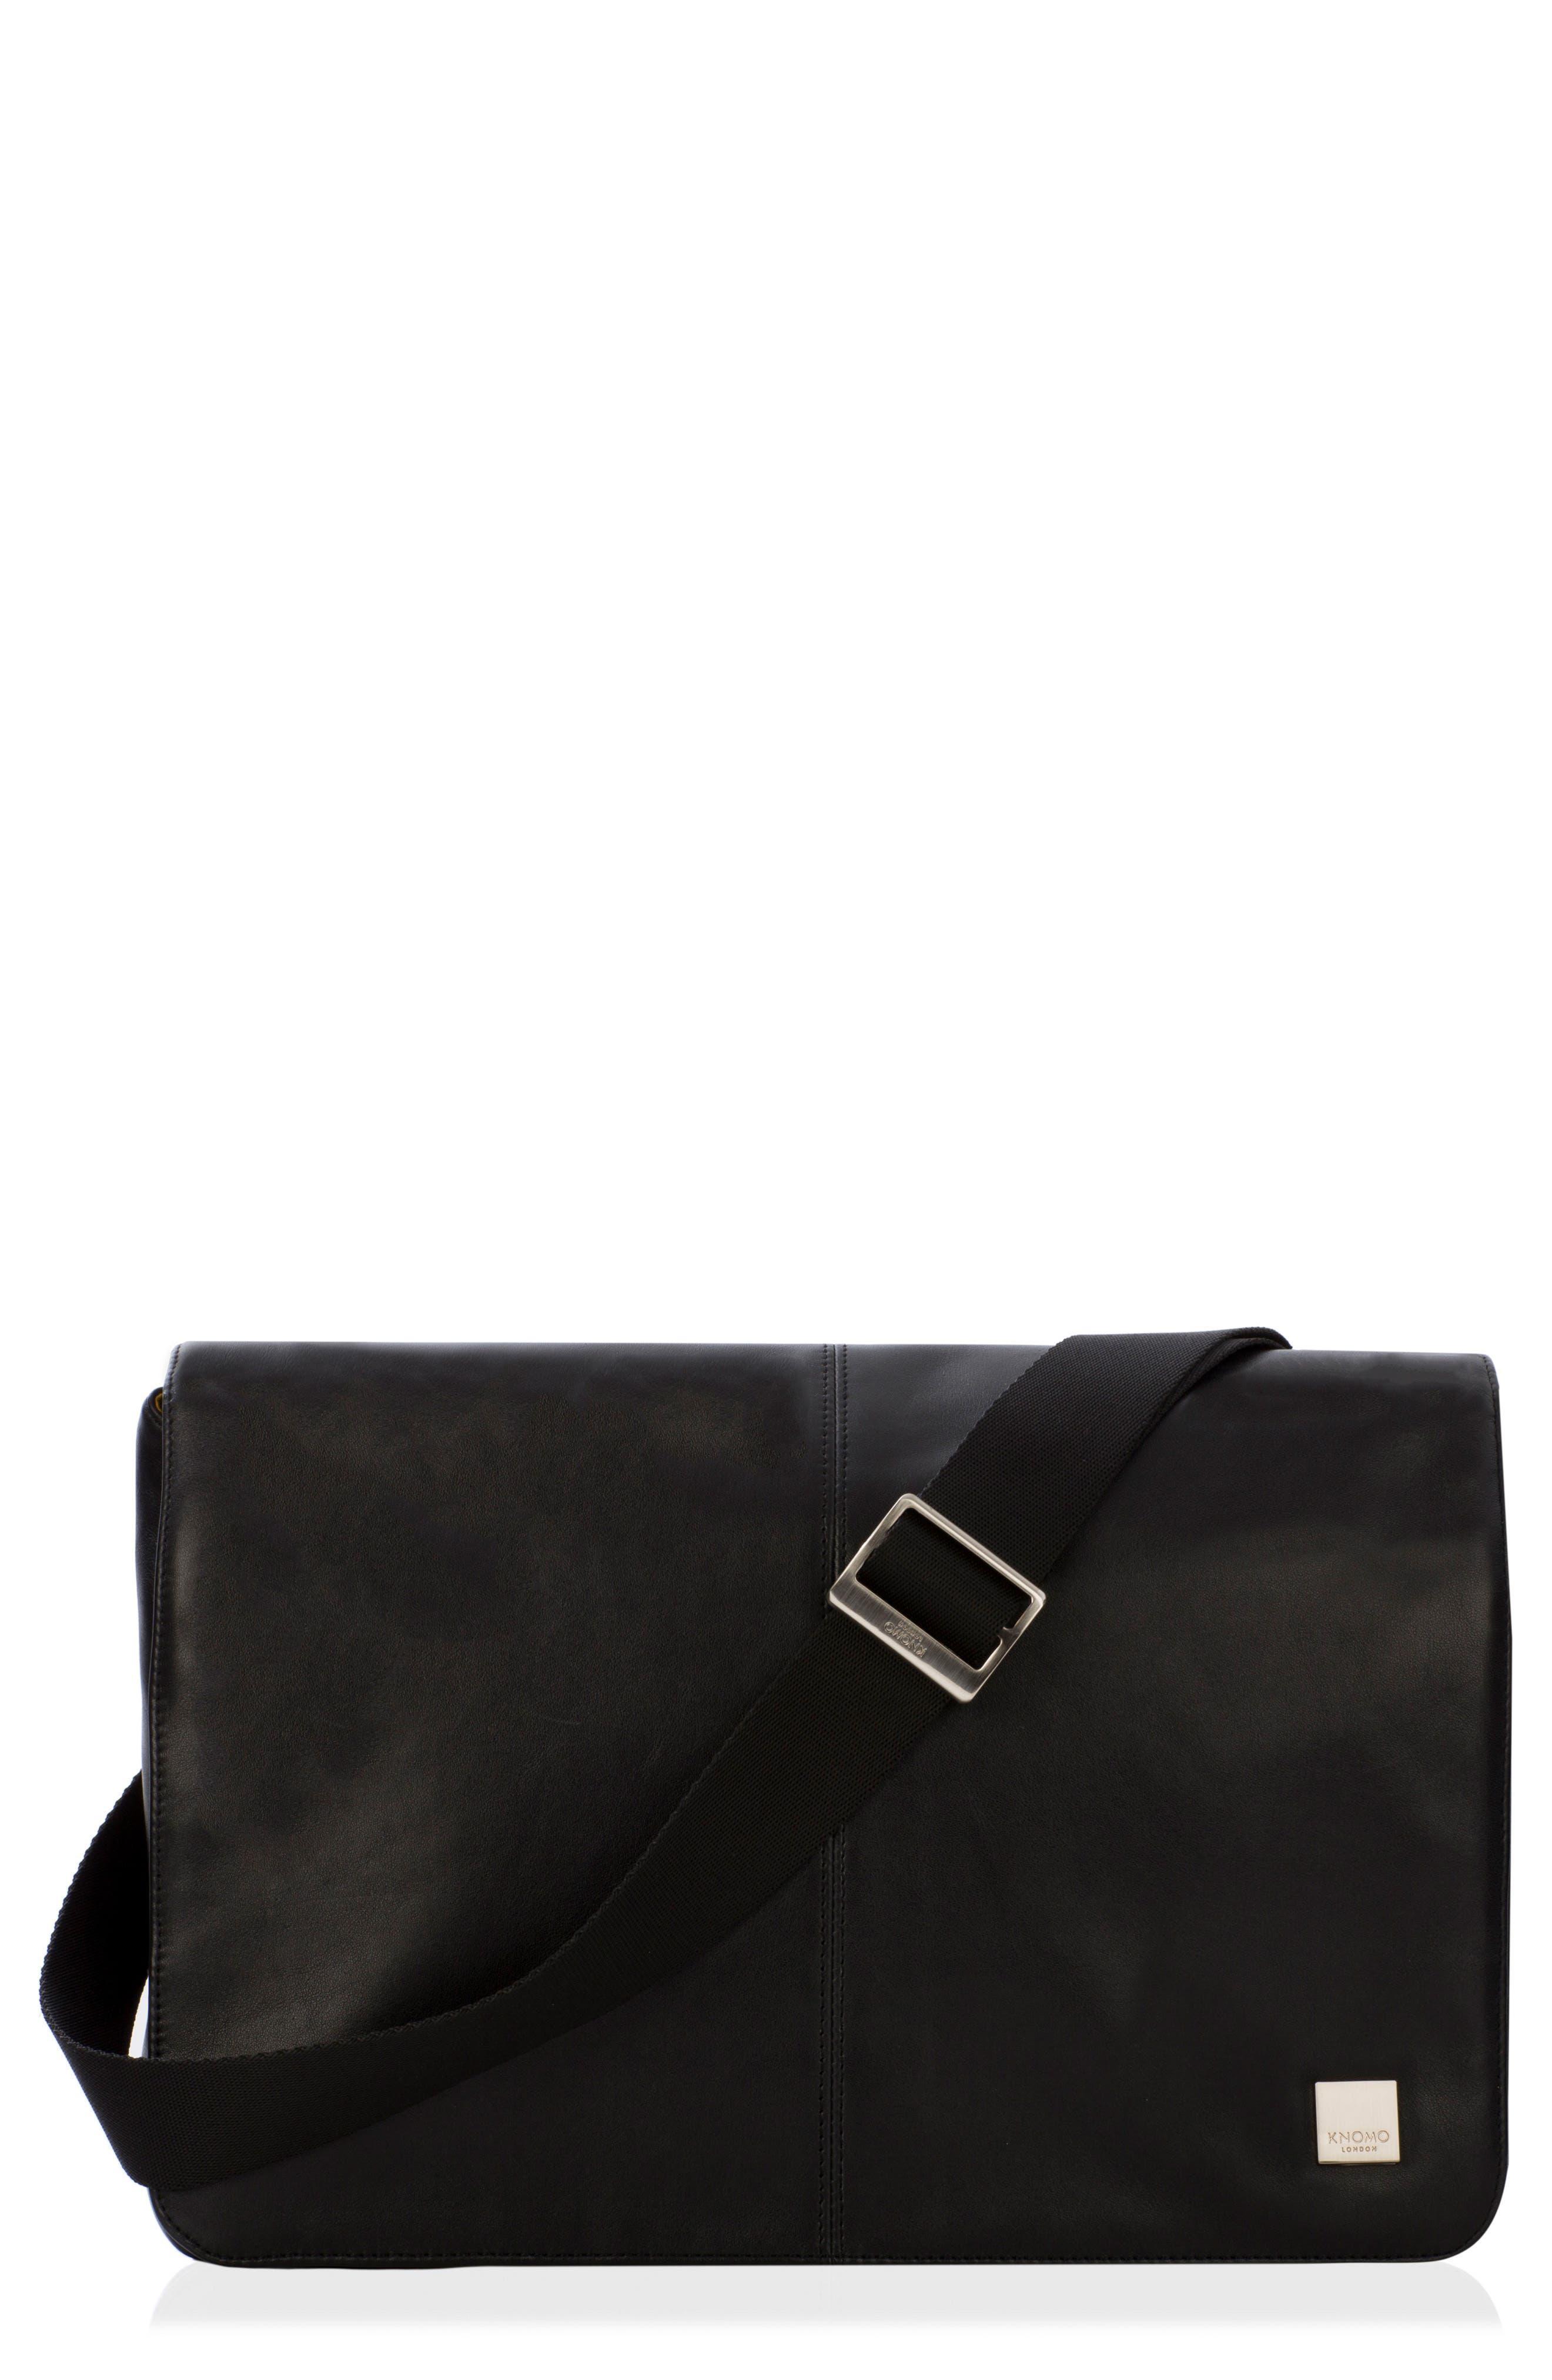 Brompton Kinsale RFID Leather Messenger Bag,                             Main thumbnail 1, color,                             001